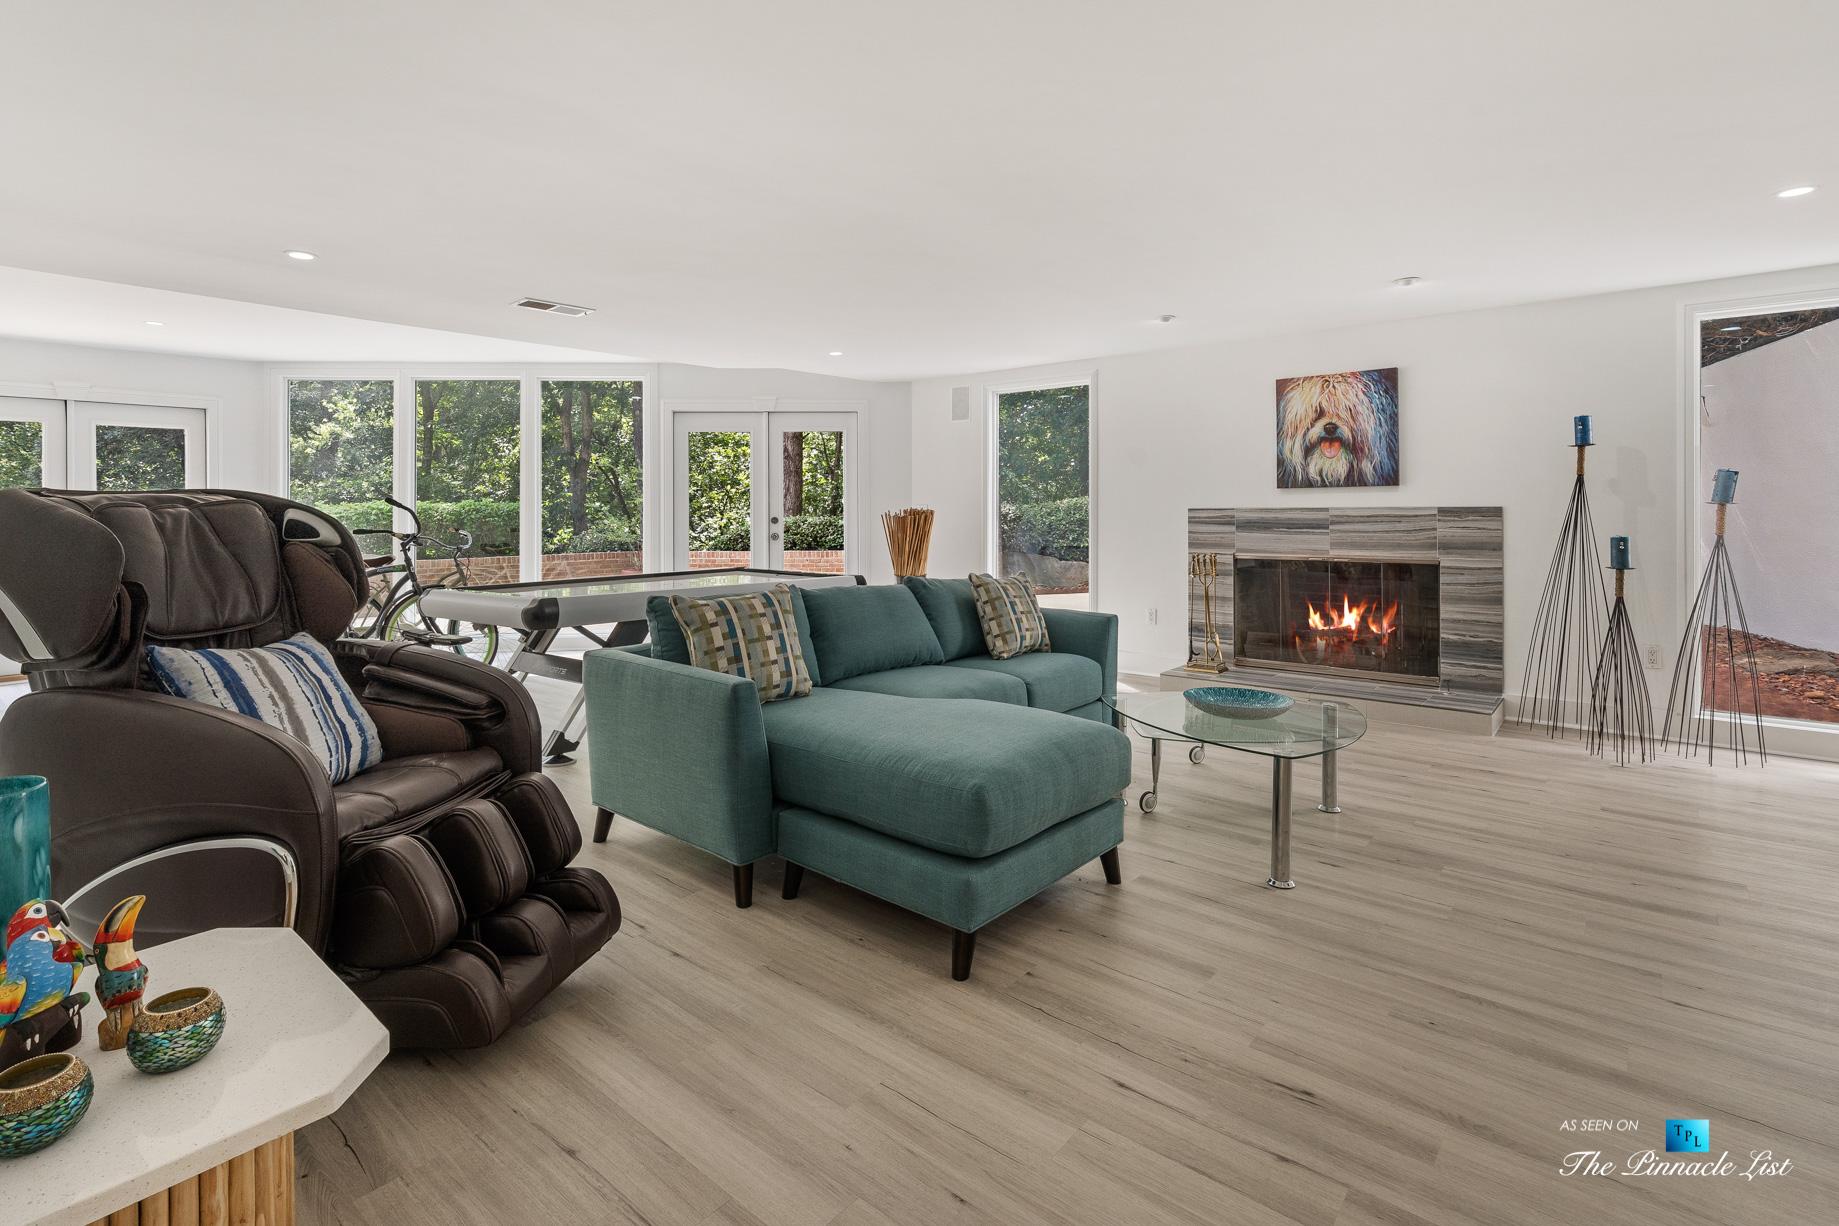 3906 Paces Ferry Rd NW, Atlanta, GA, USA - Basement Recreation Room - Luxury Real Estate - Buckhead Home